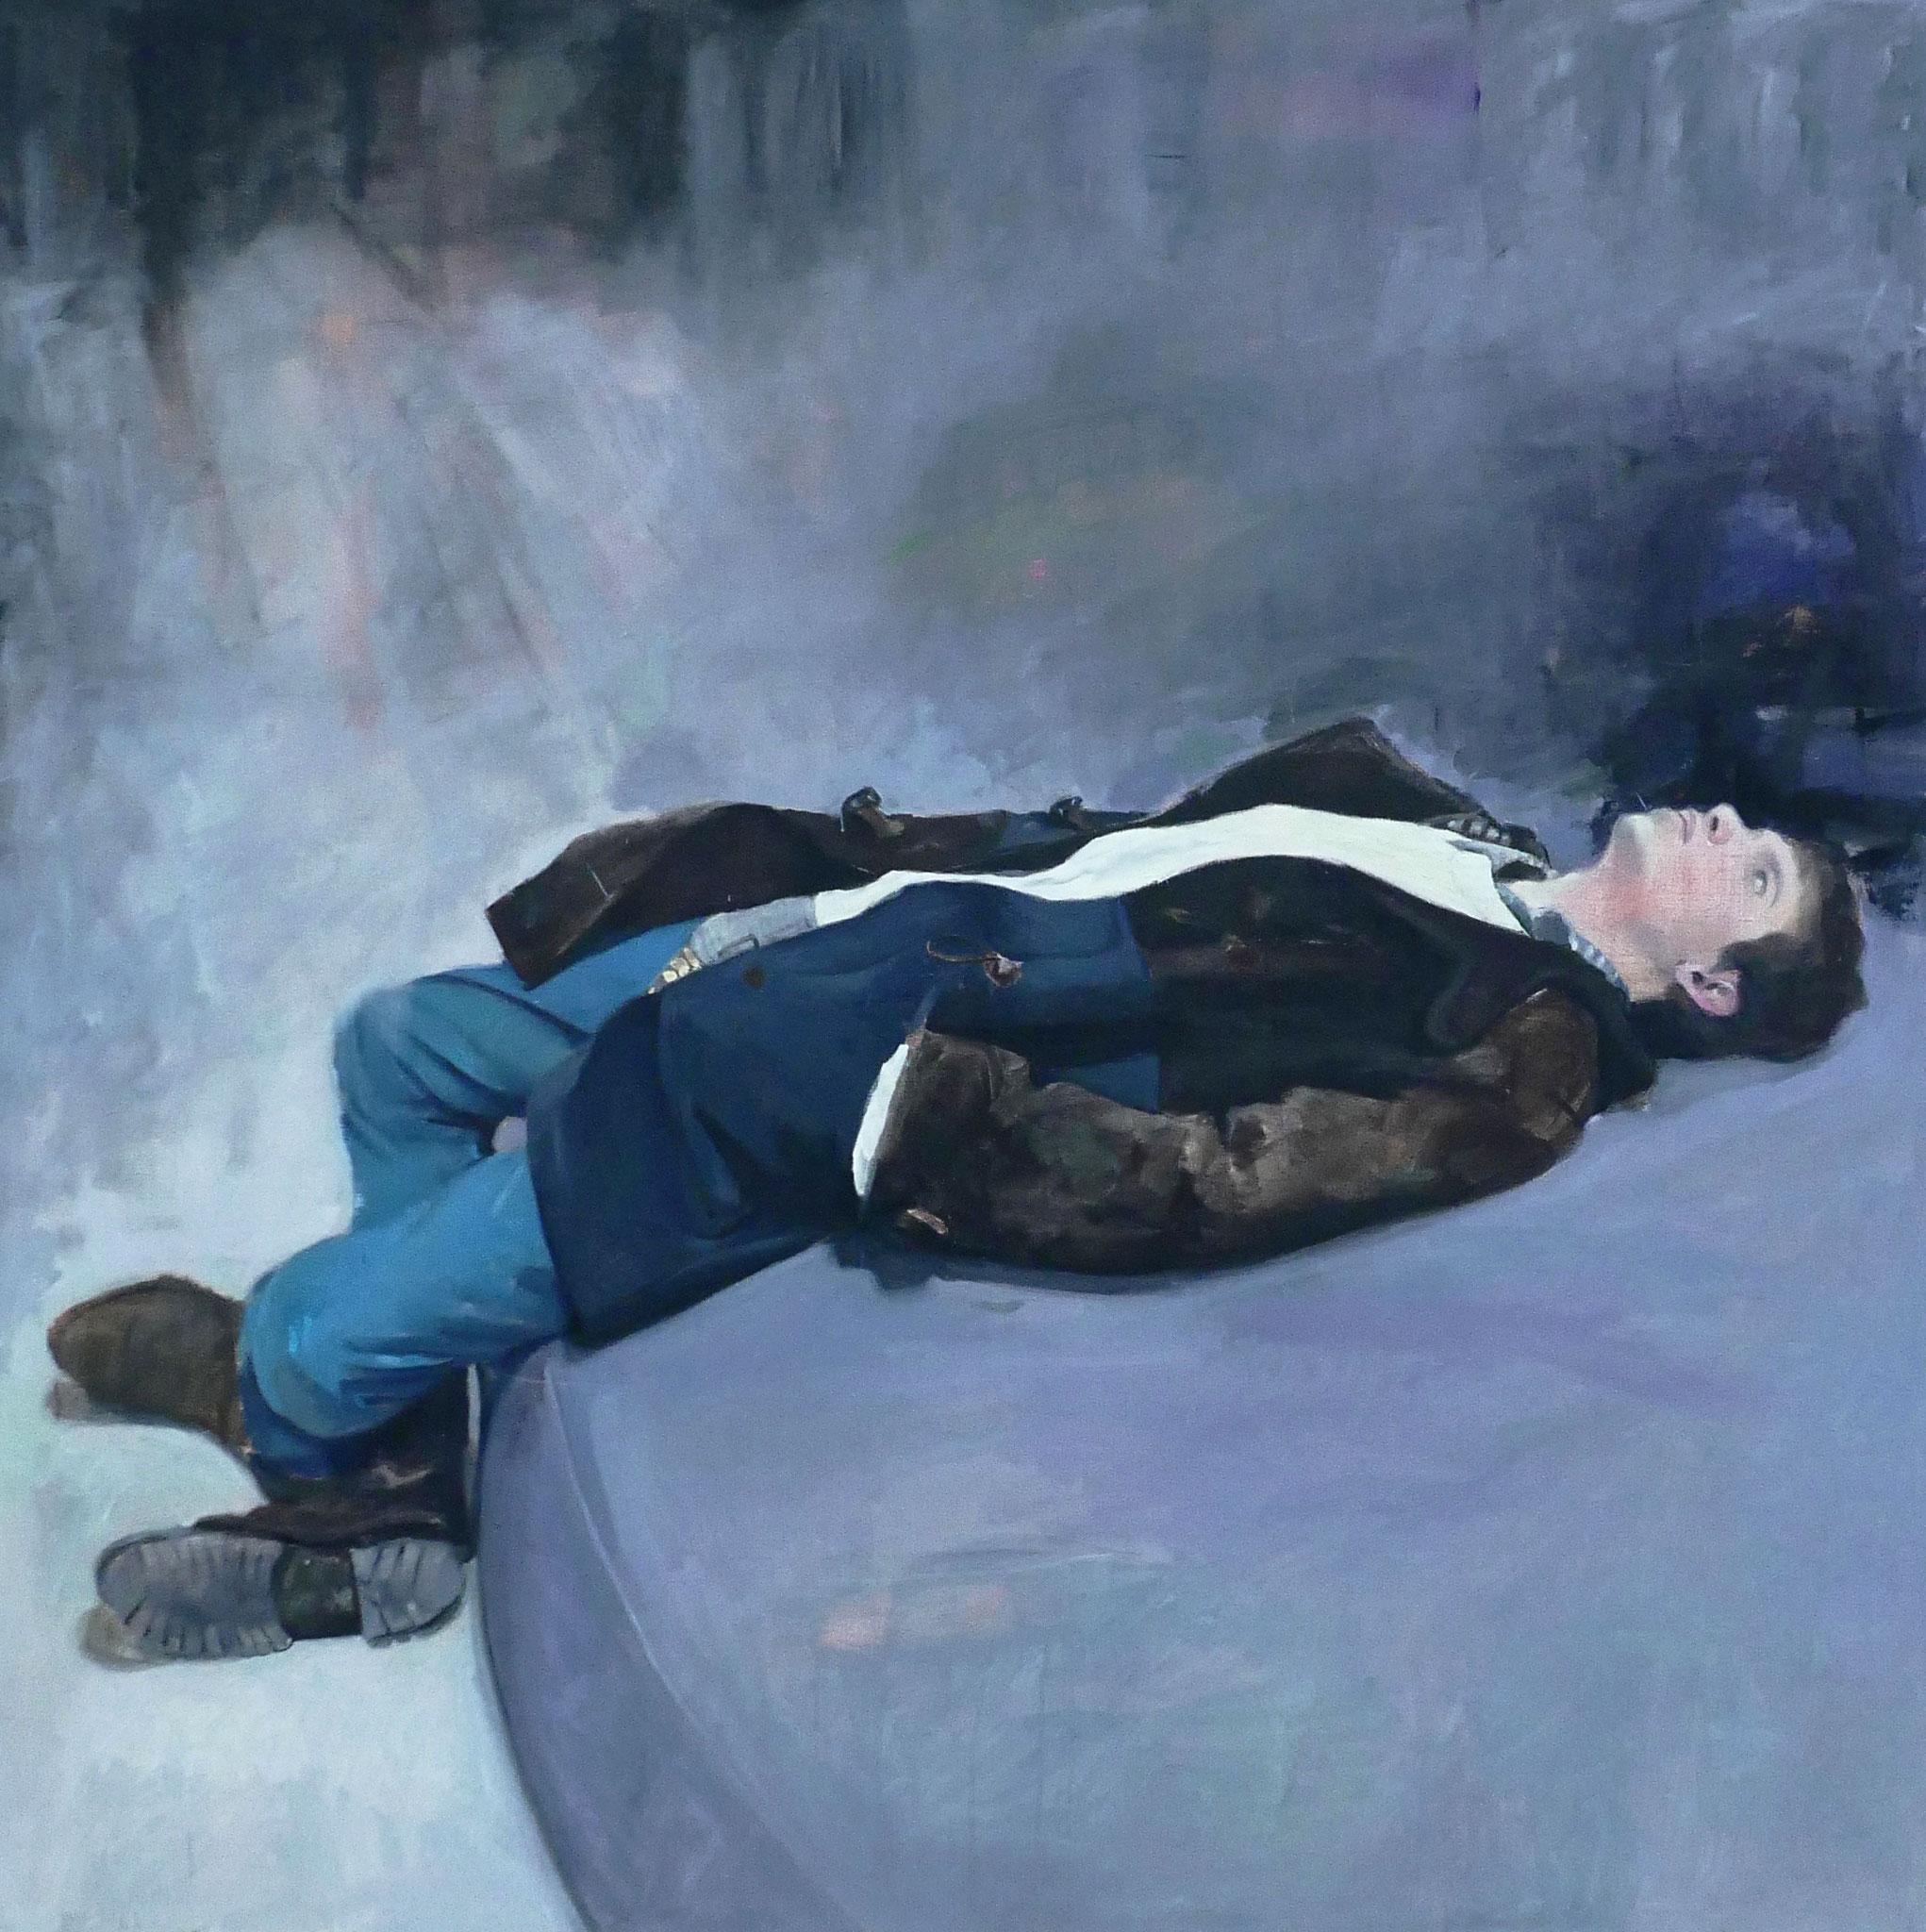 HUGO Huile sur toile  150 cmx 150cm  2017